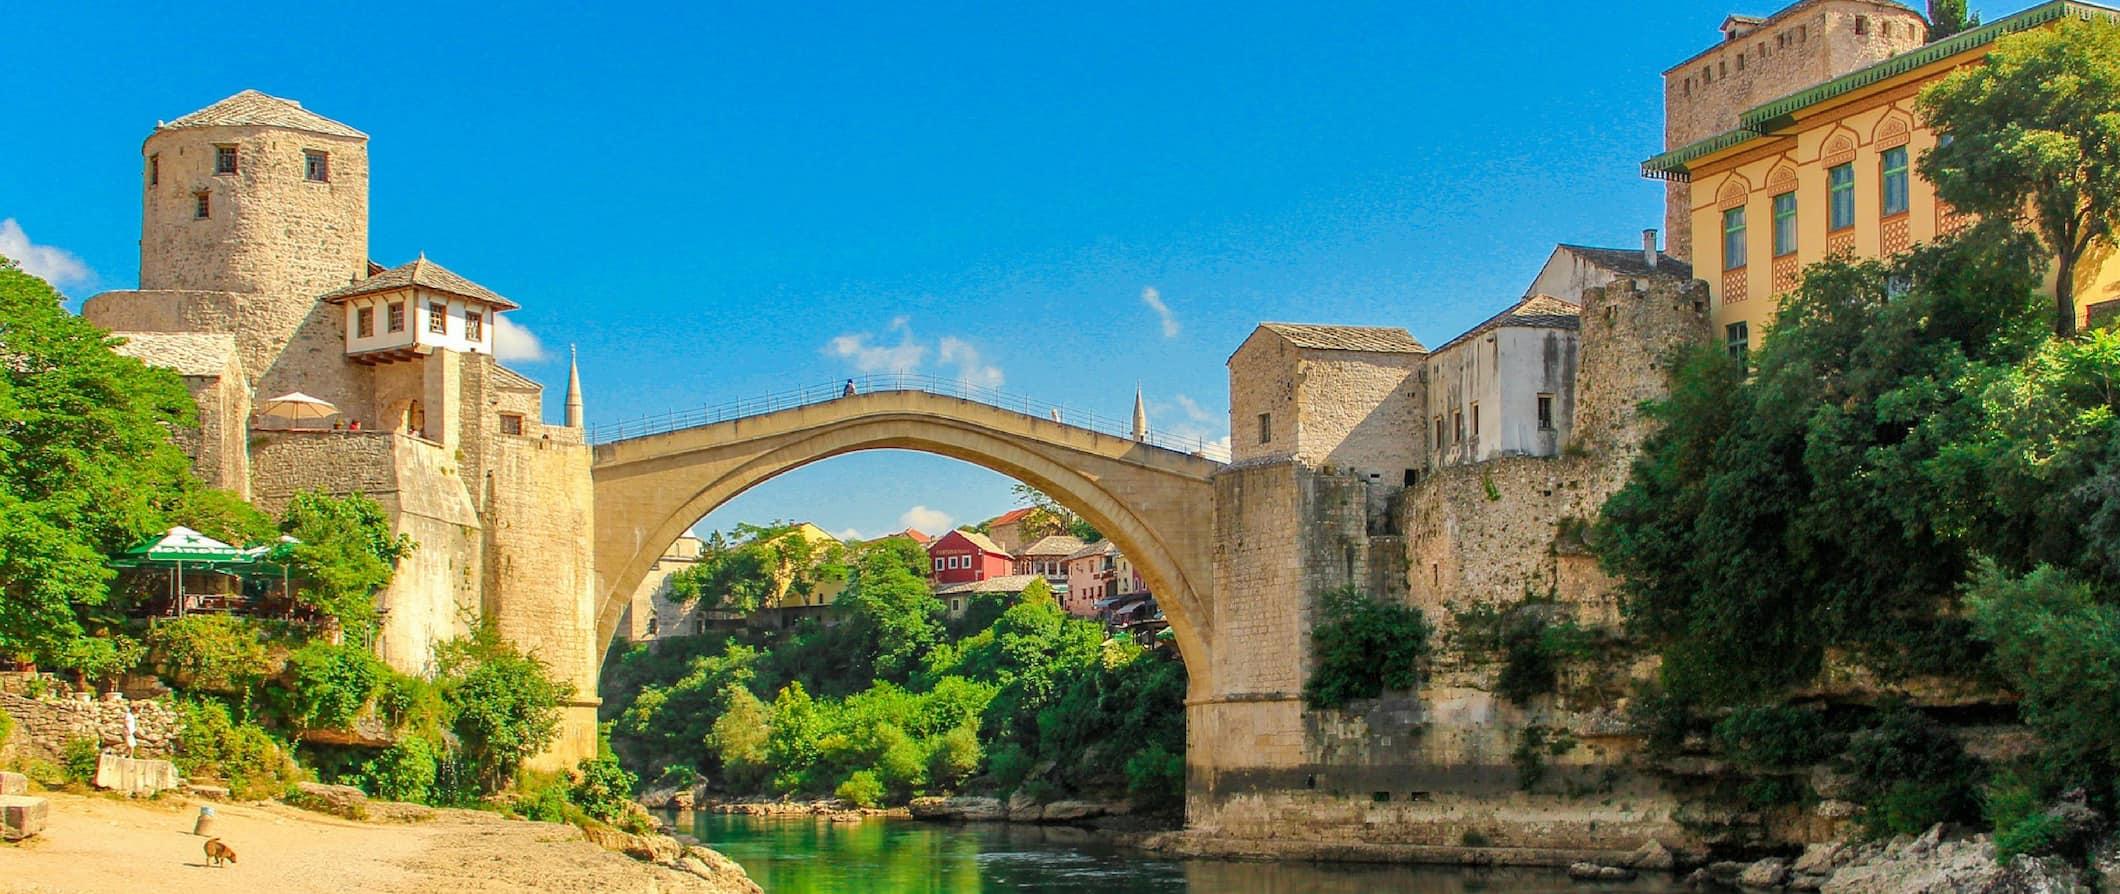 a view of a bridge across water in Bosnia & Herzegovina